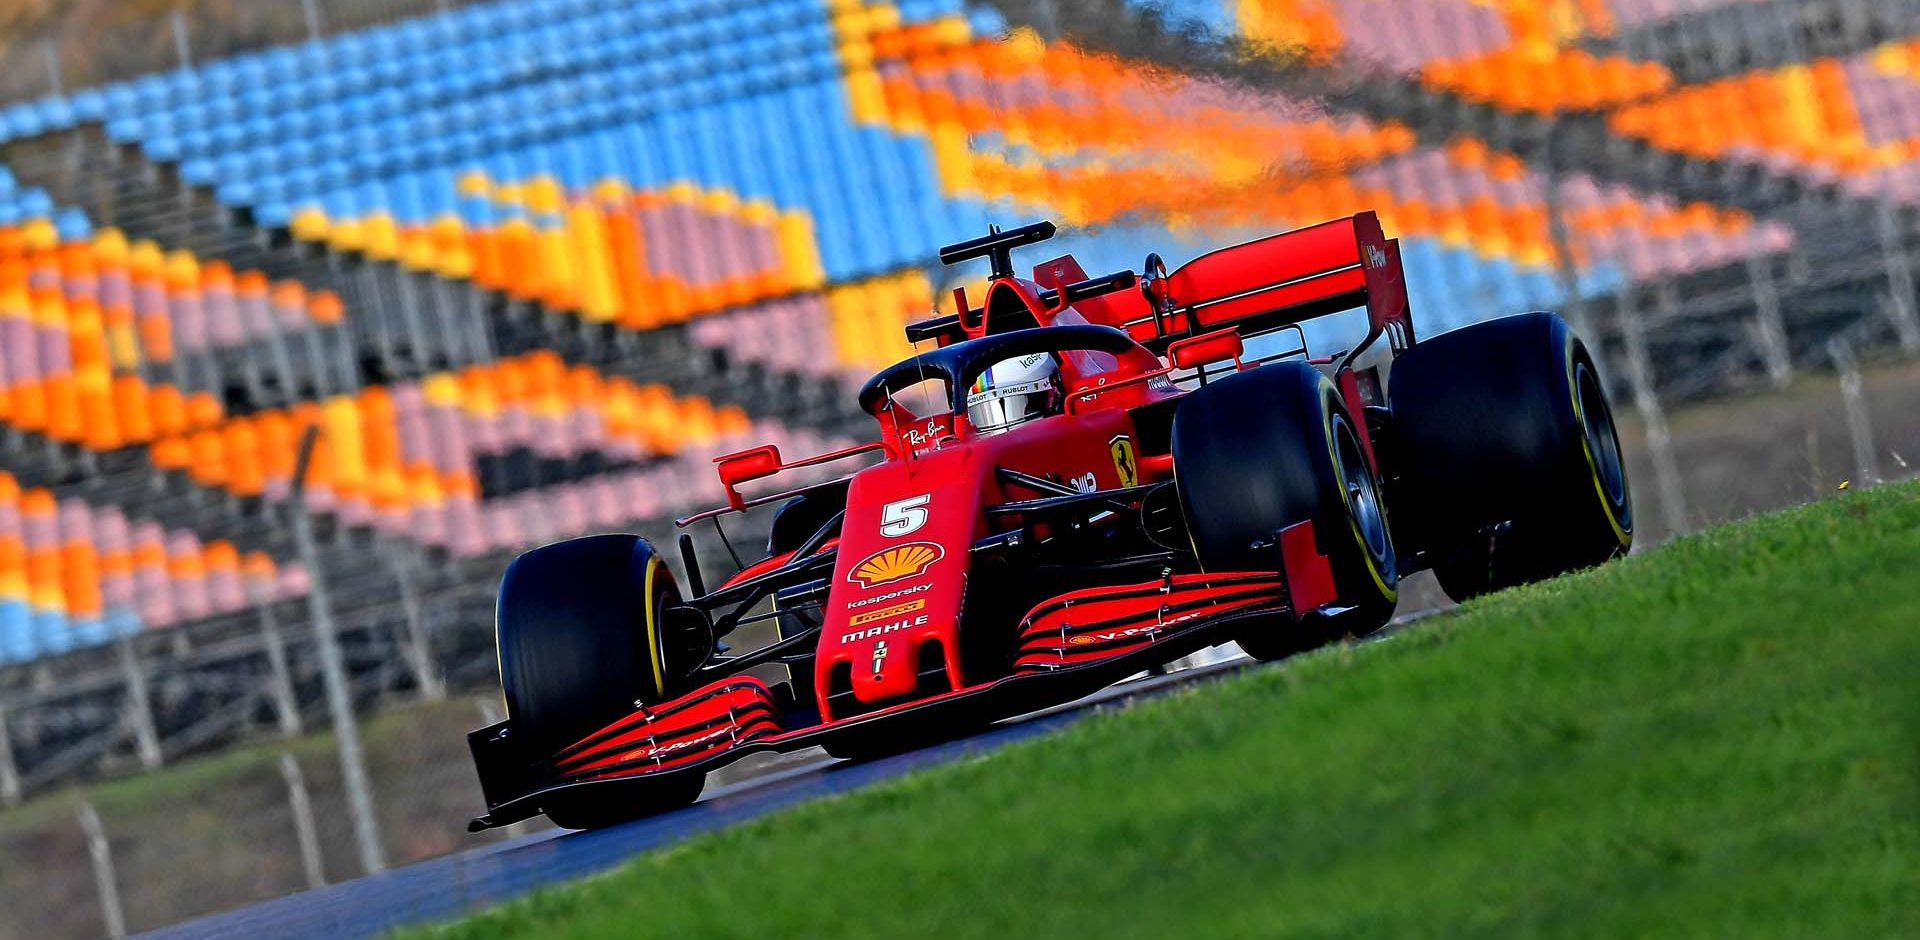 GP TURCHIA  F1/2020 -  VENERDÌ  13/11/2020    credit: @Scuderia Ferrari Press Office Sebastian Vettel Ferrari